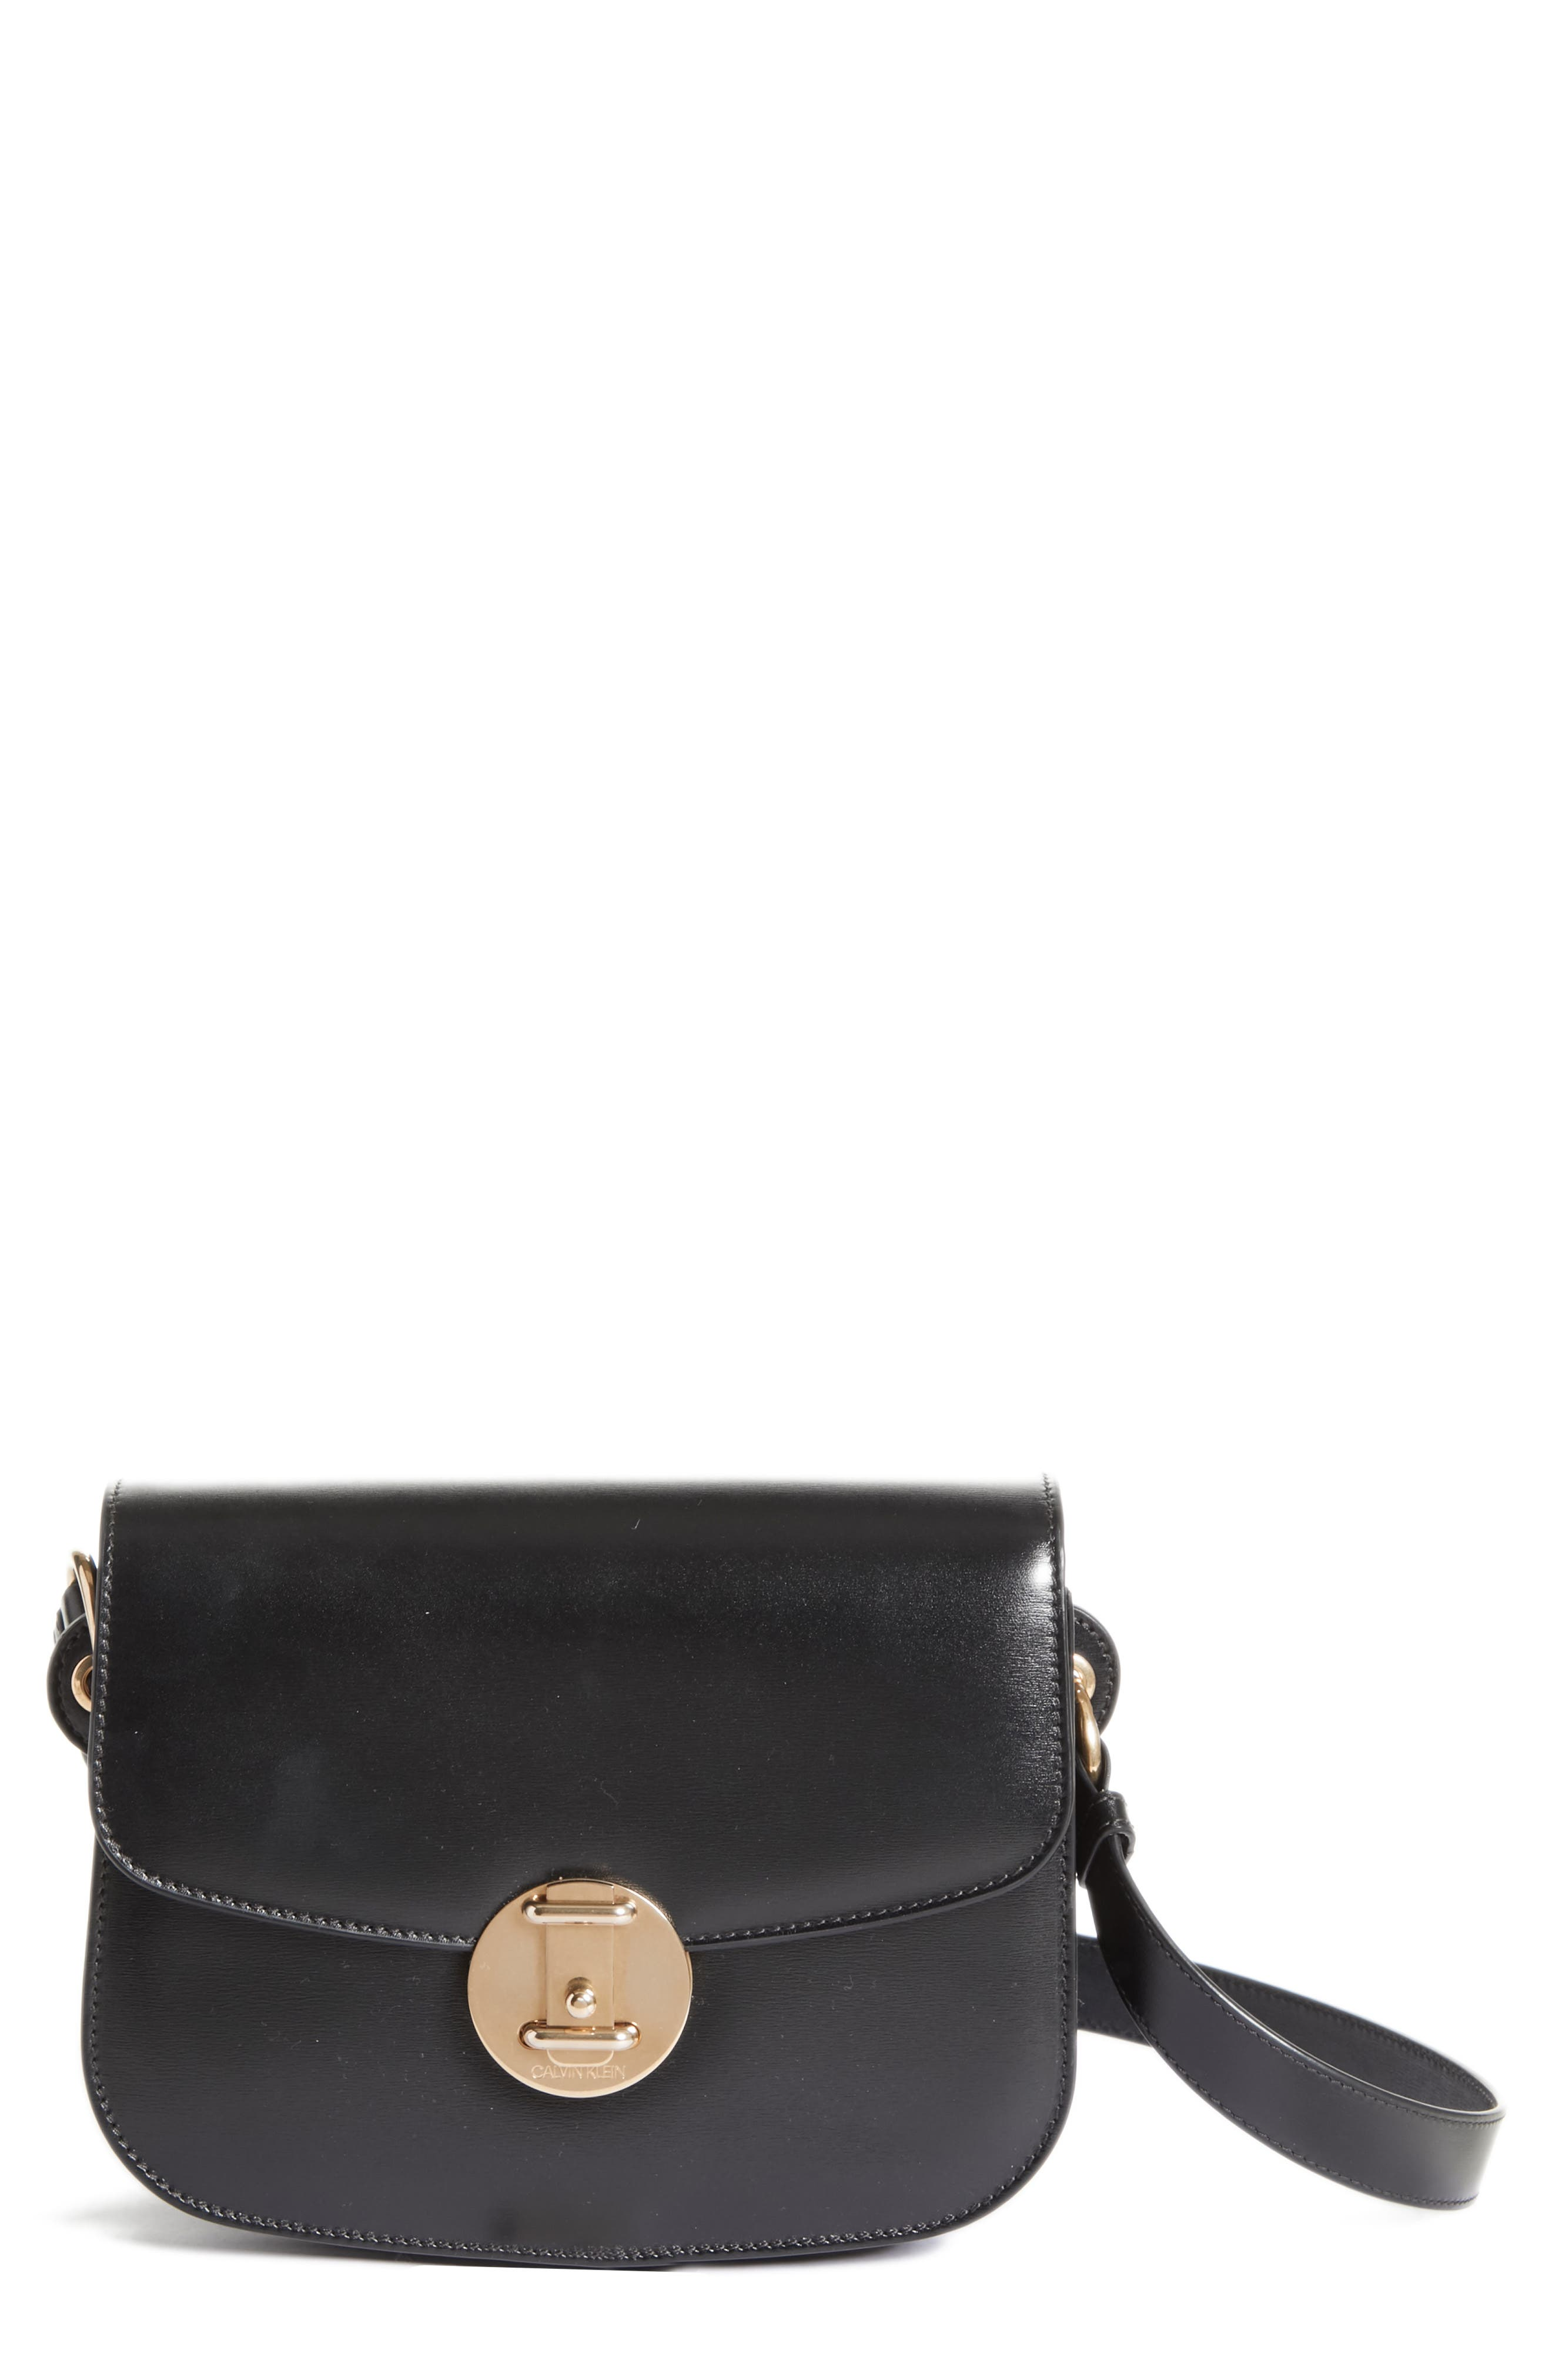 CALVIN KLEIN 209W39NYC Small Round Lock Shoulder Bag,                         Main,                         color, BLACK